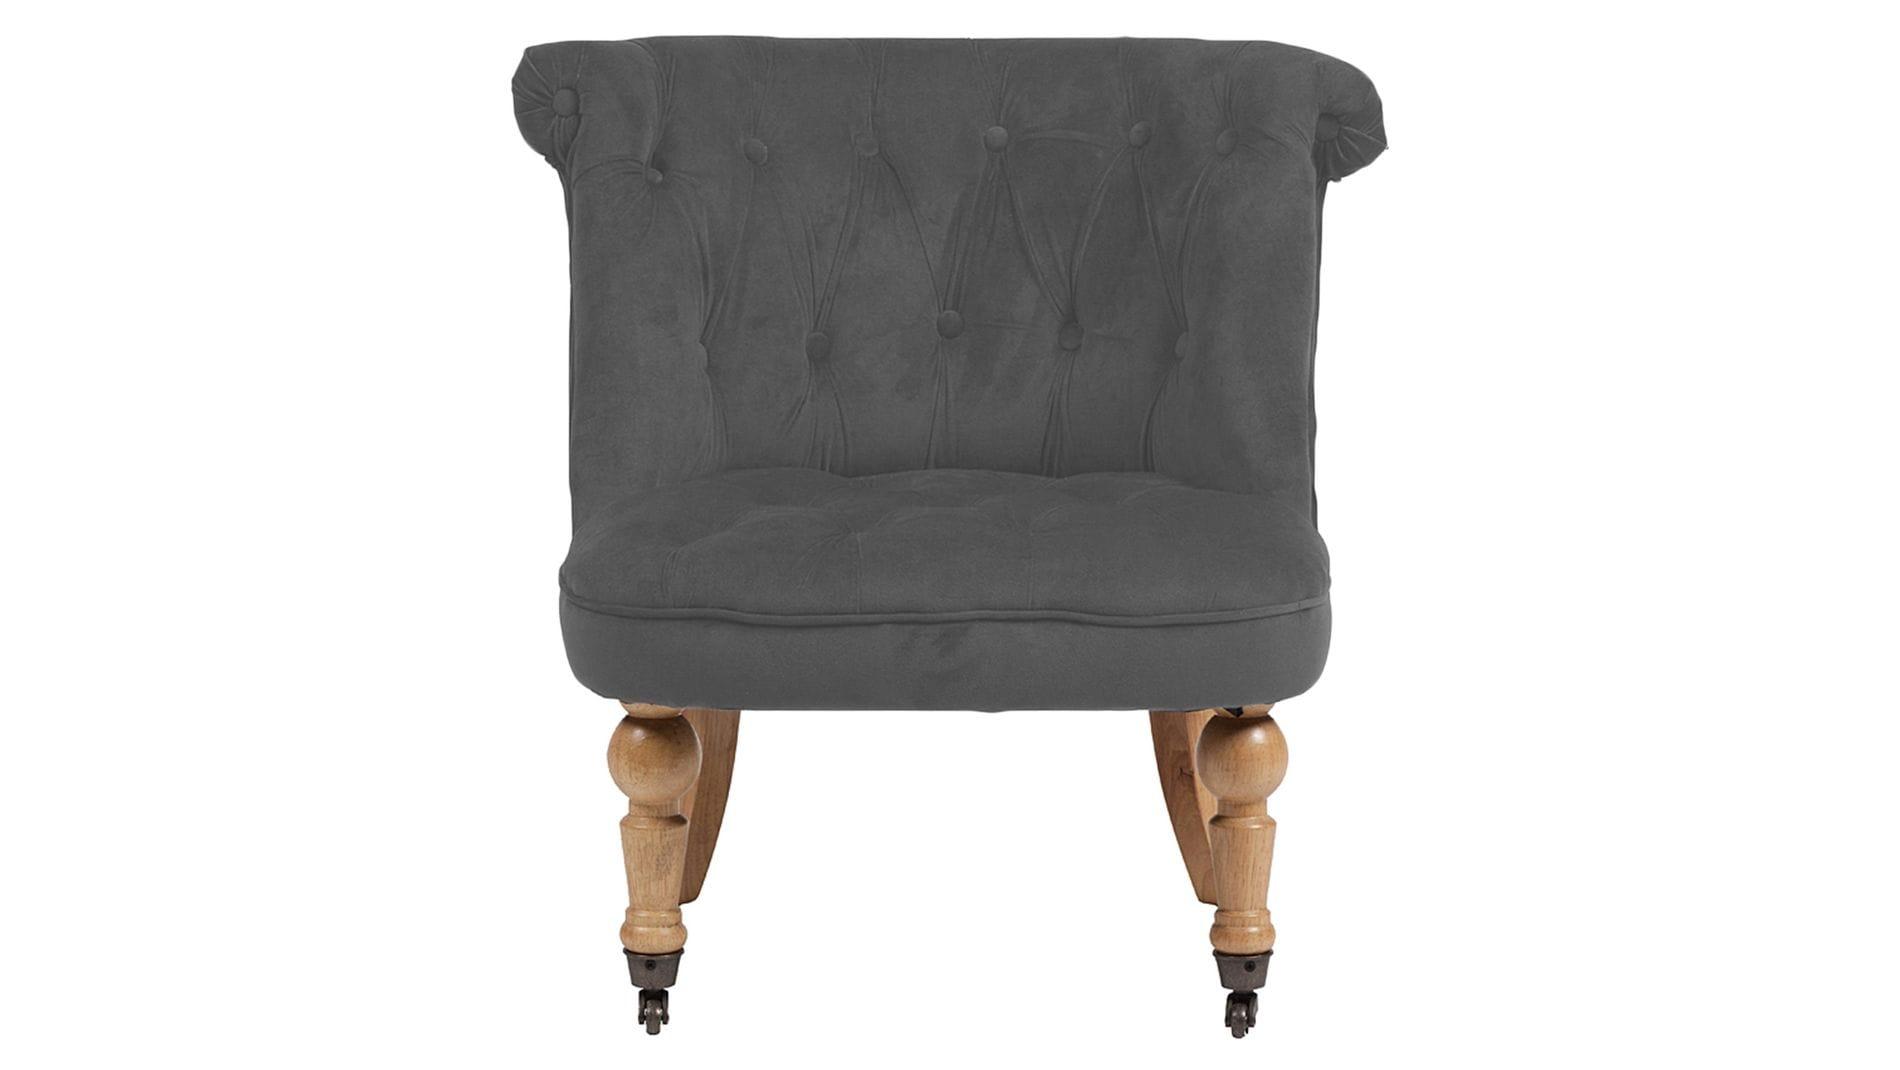 Кресло Amelie French Country Chair Светло-серый Велюр М